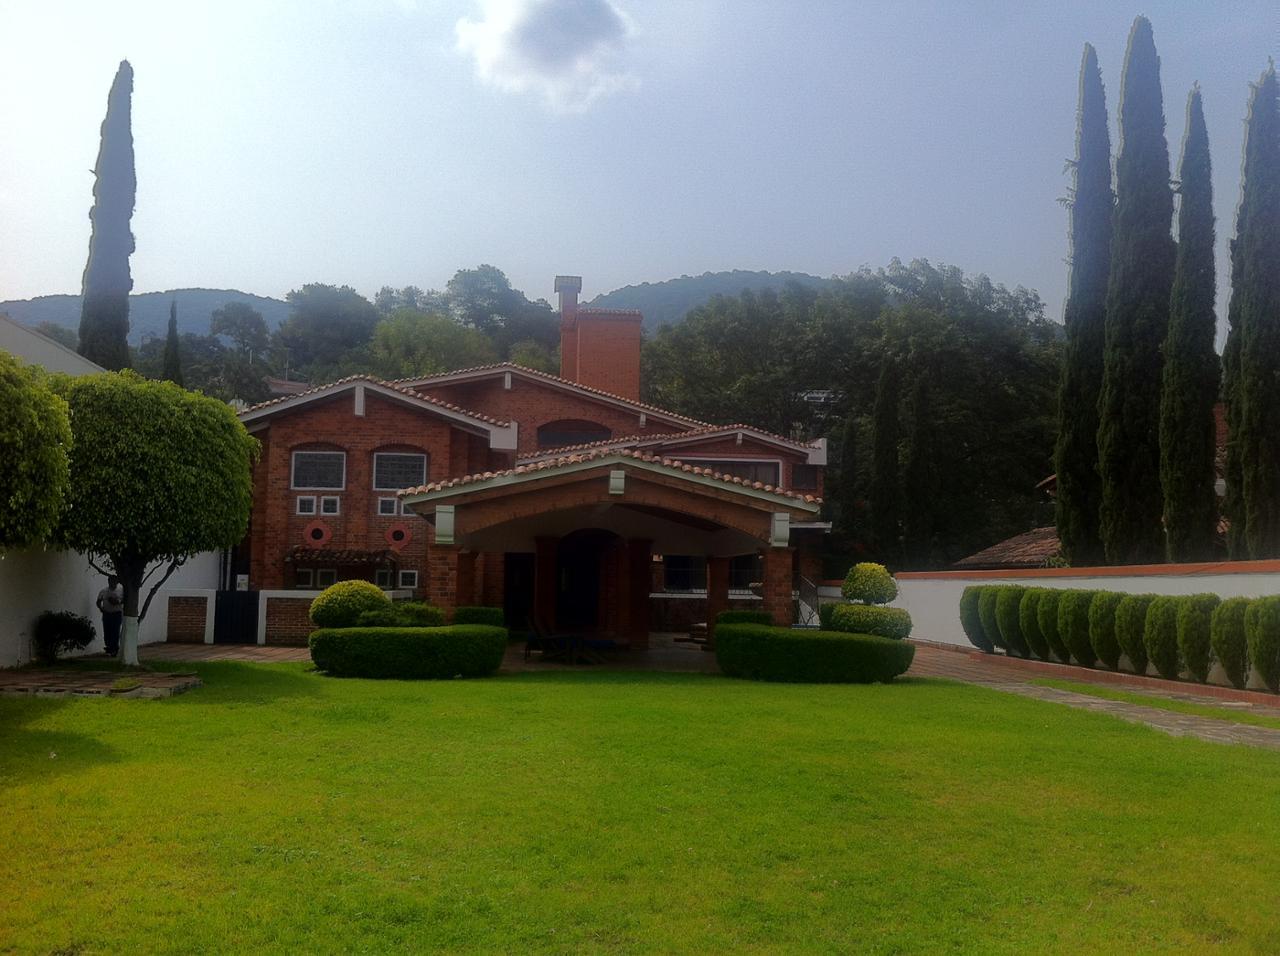 Venta casa en valle de bravo m xico 498783 for Casas en valle de bravo